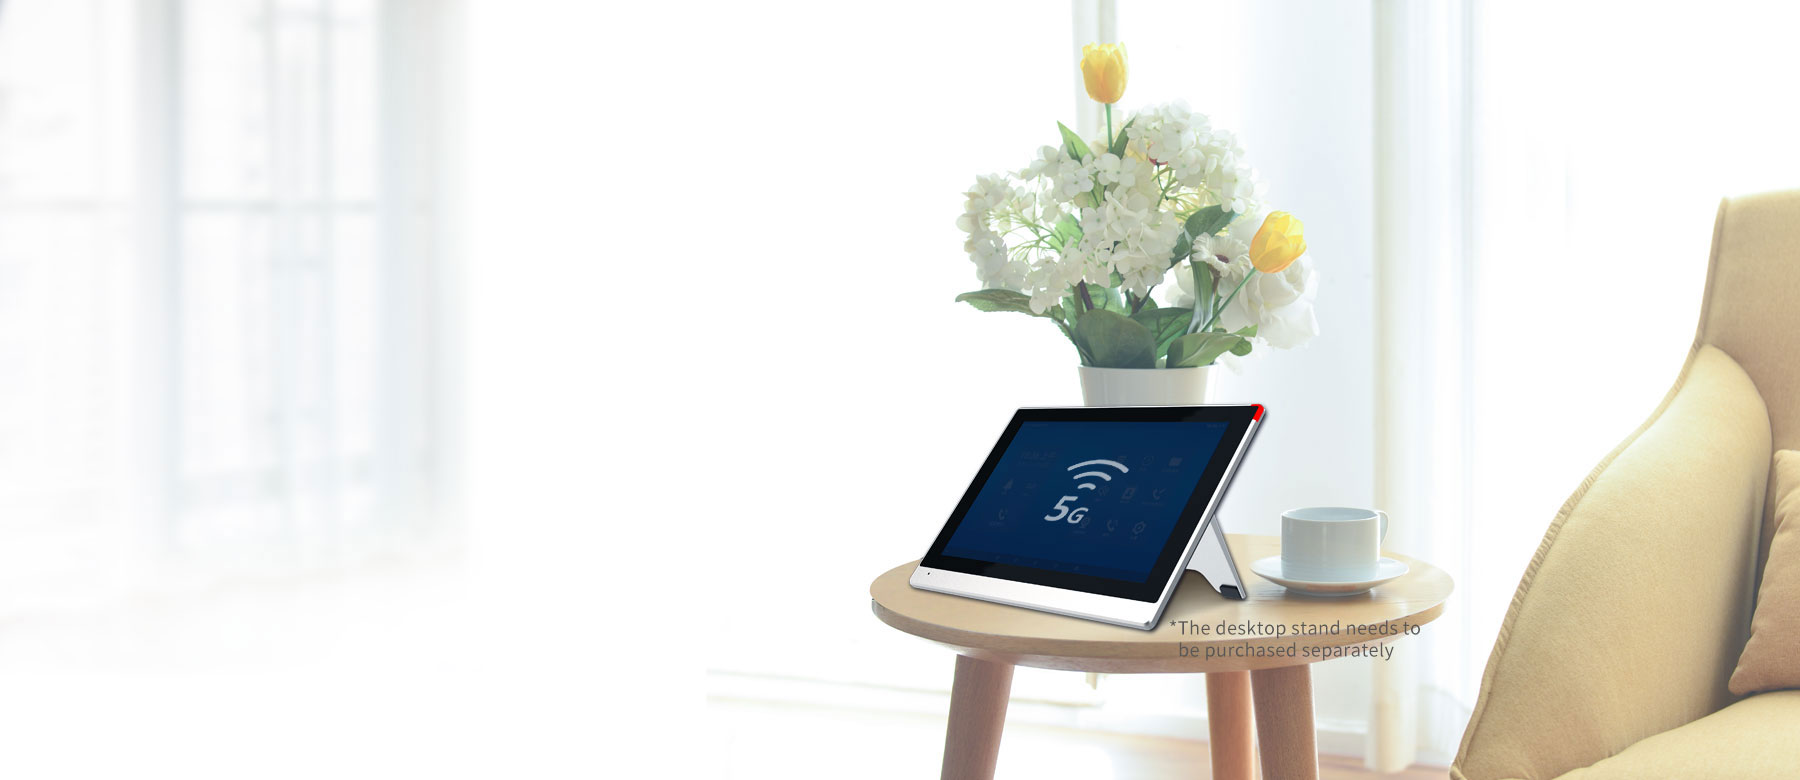 Fanvil I56 Built-in 2.4G/5G Wi-Fi